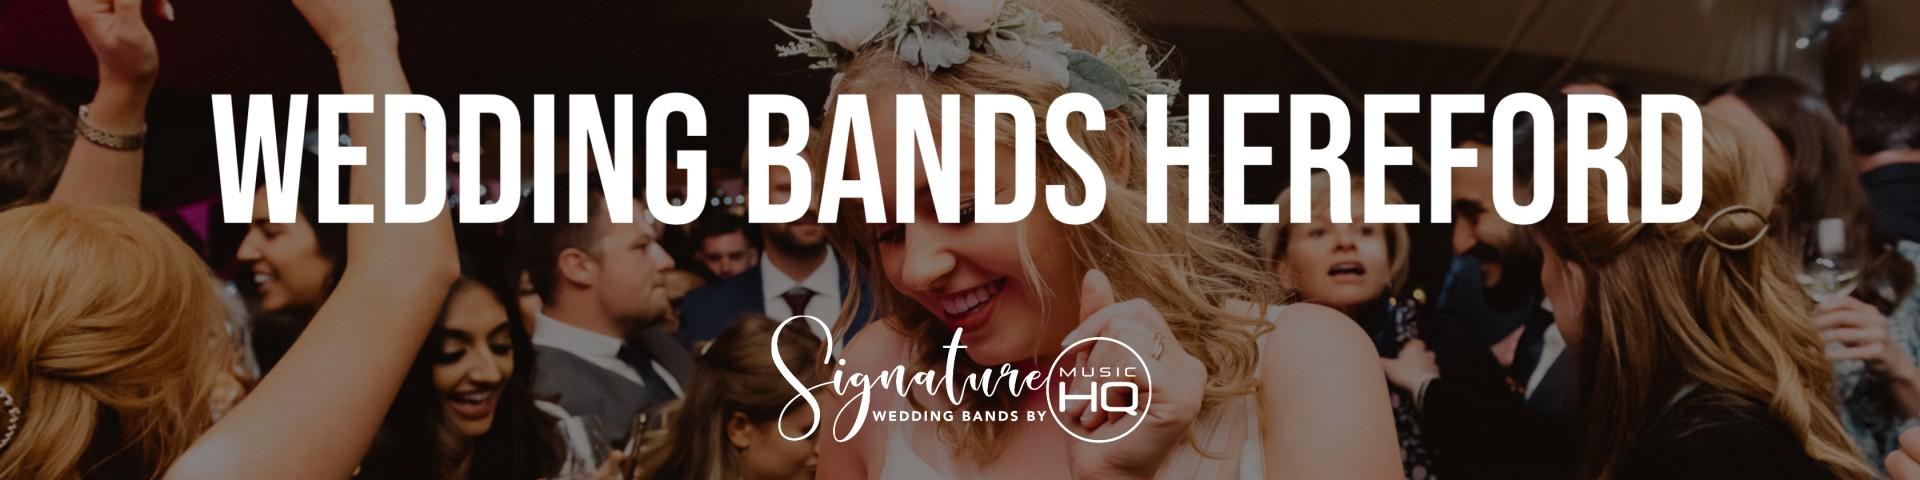 Best South West wedding bands